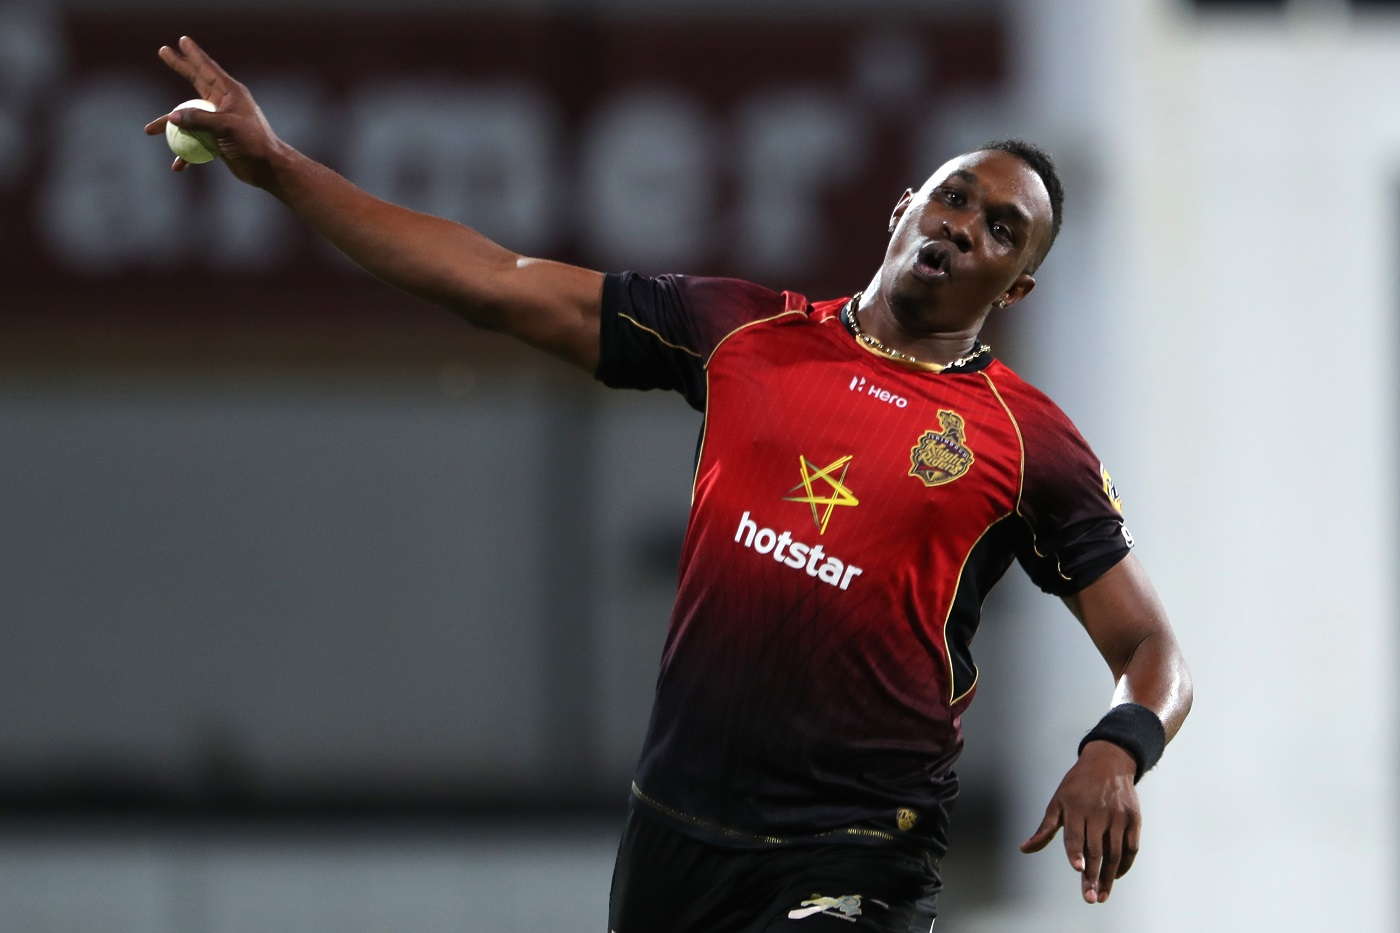 Dwayne Bravo Announces Retirement From International Cricket 2